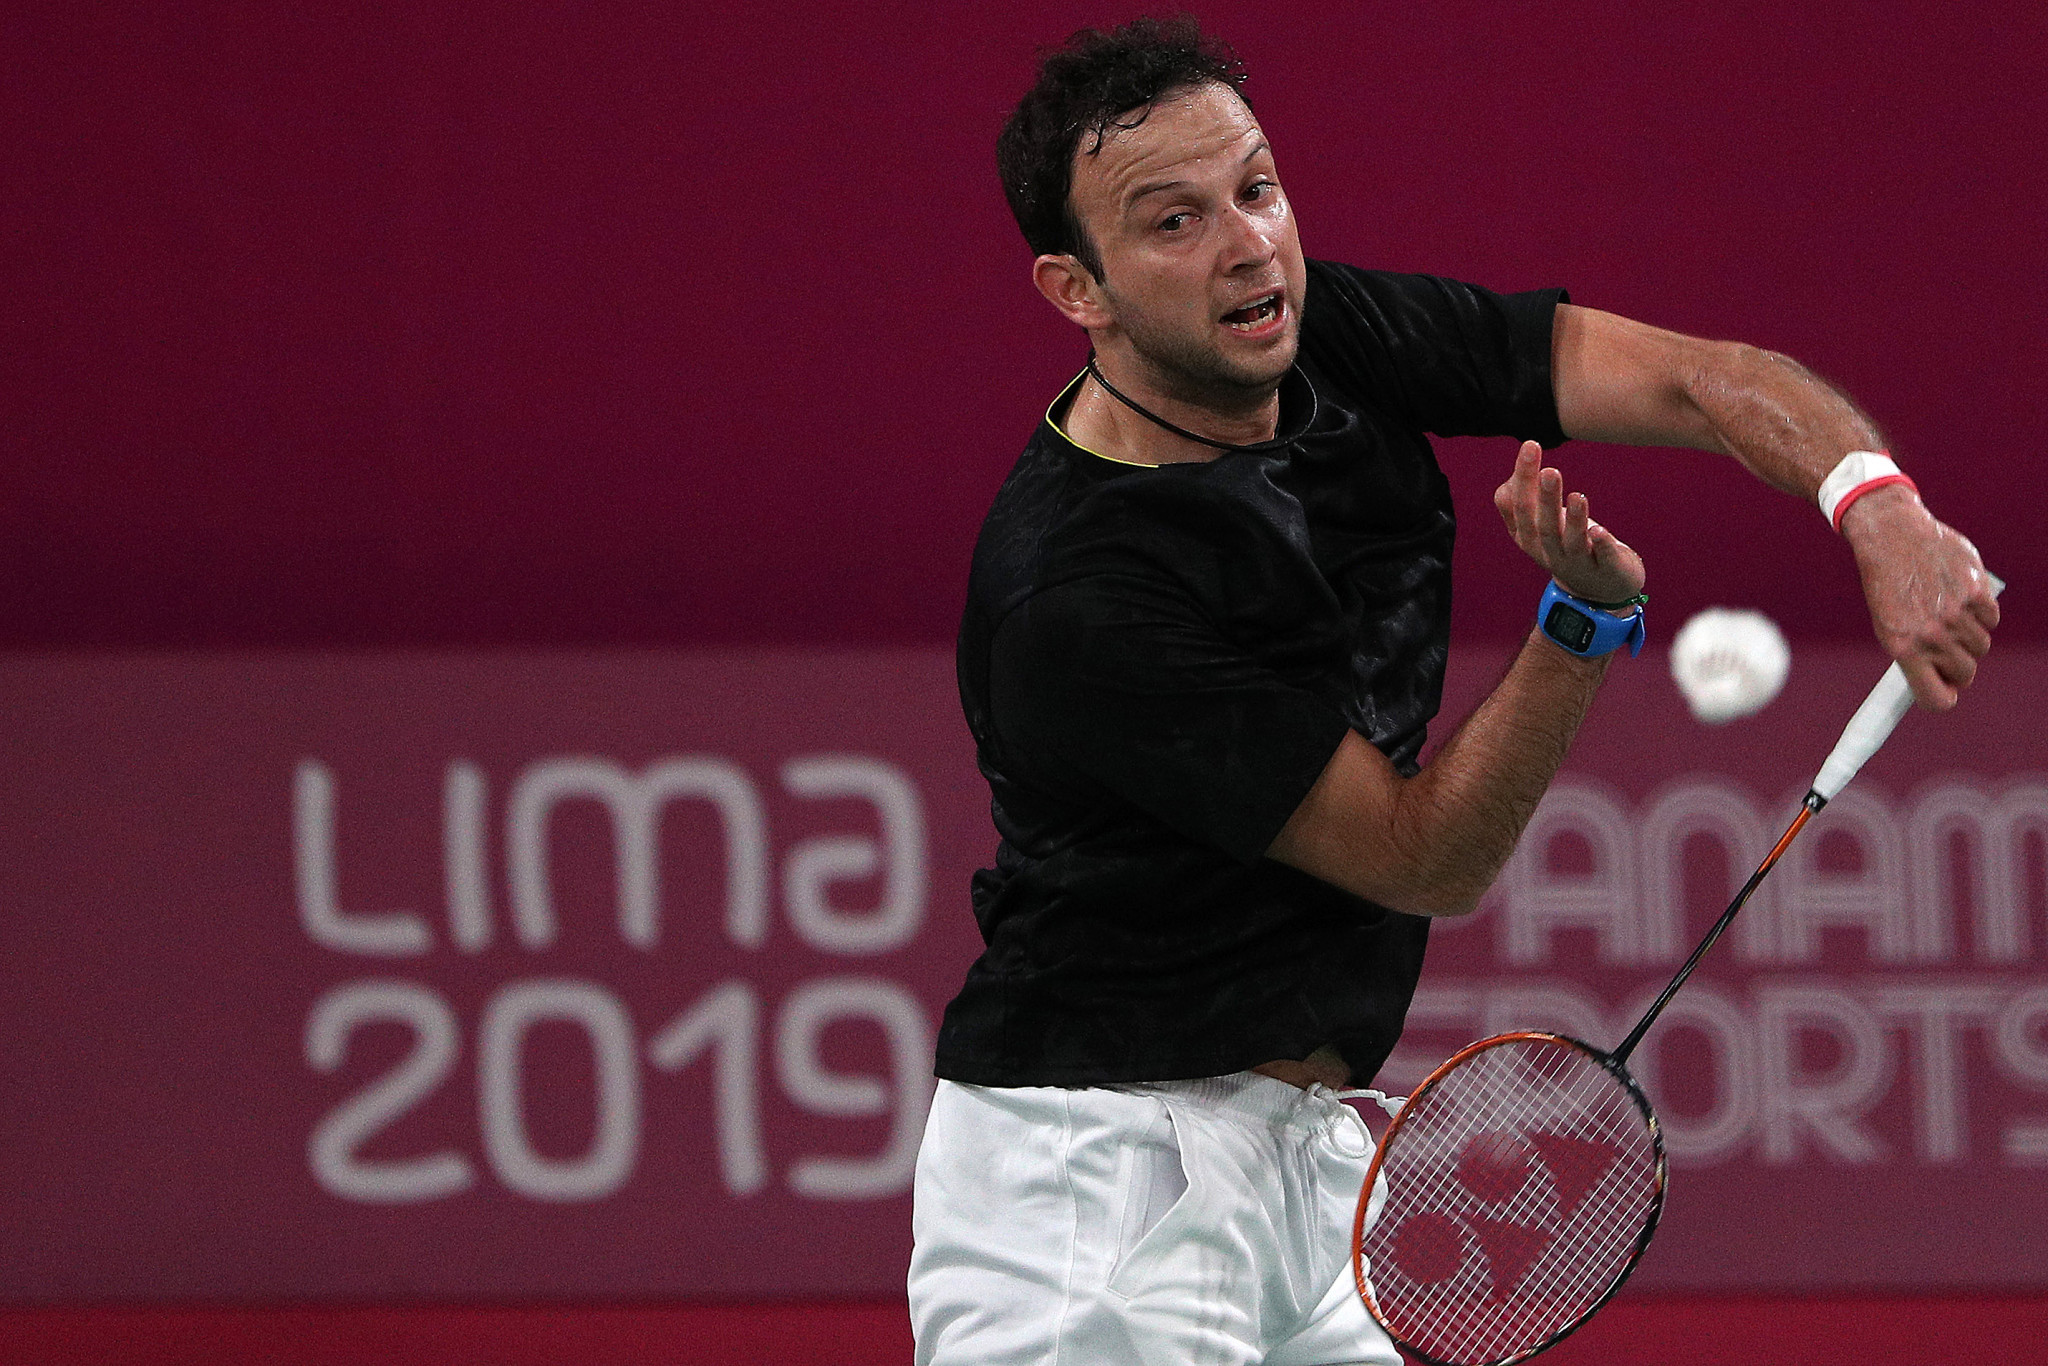 Guatemala City to host Pan American Individual Badminton Championships